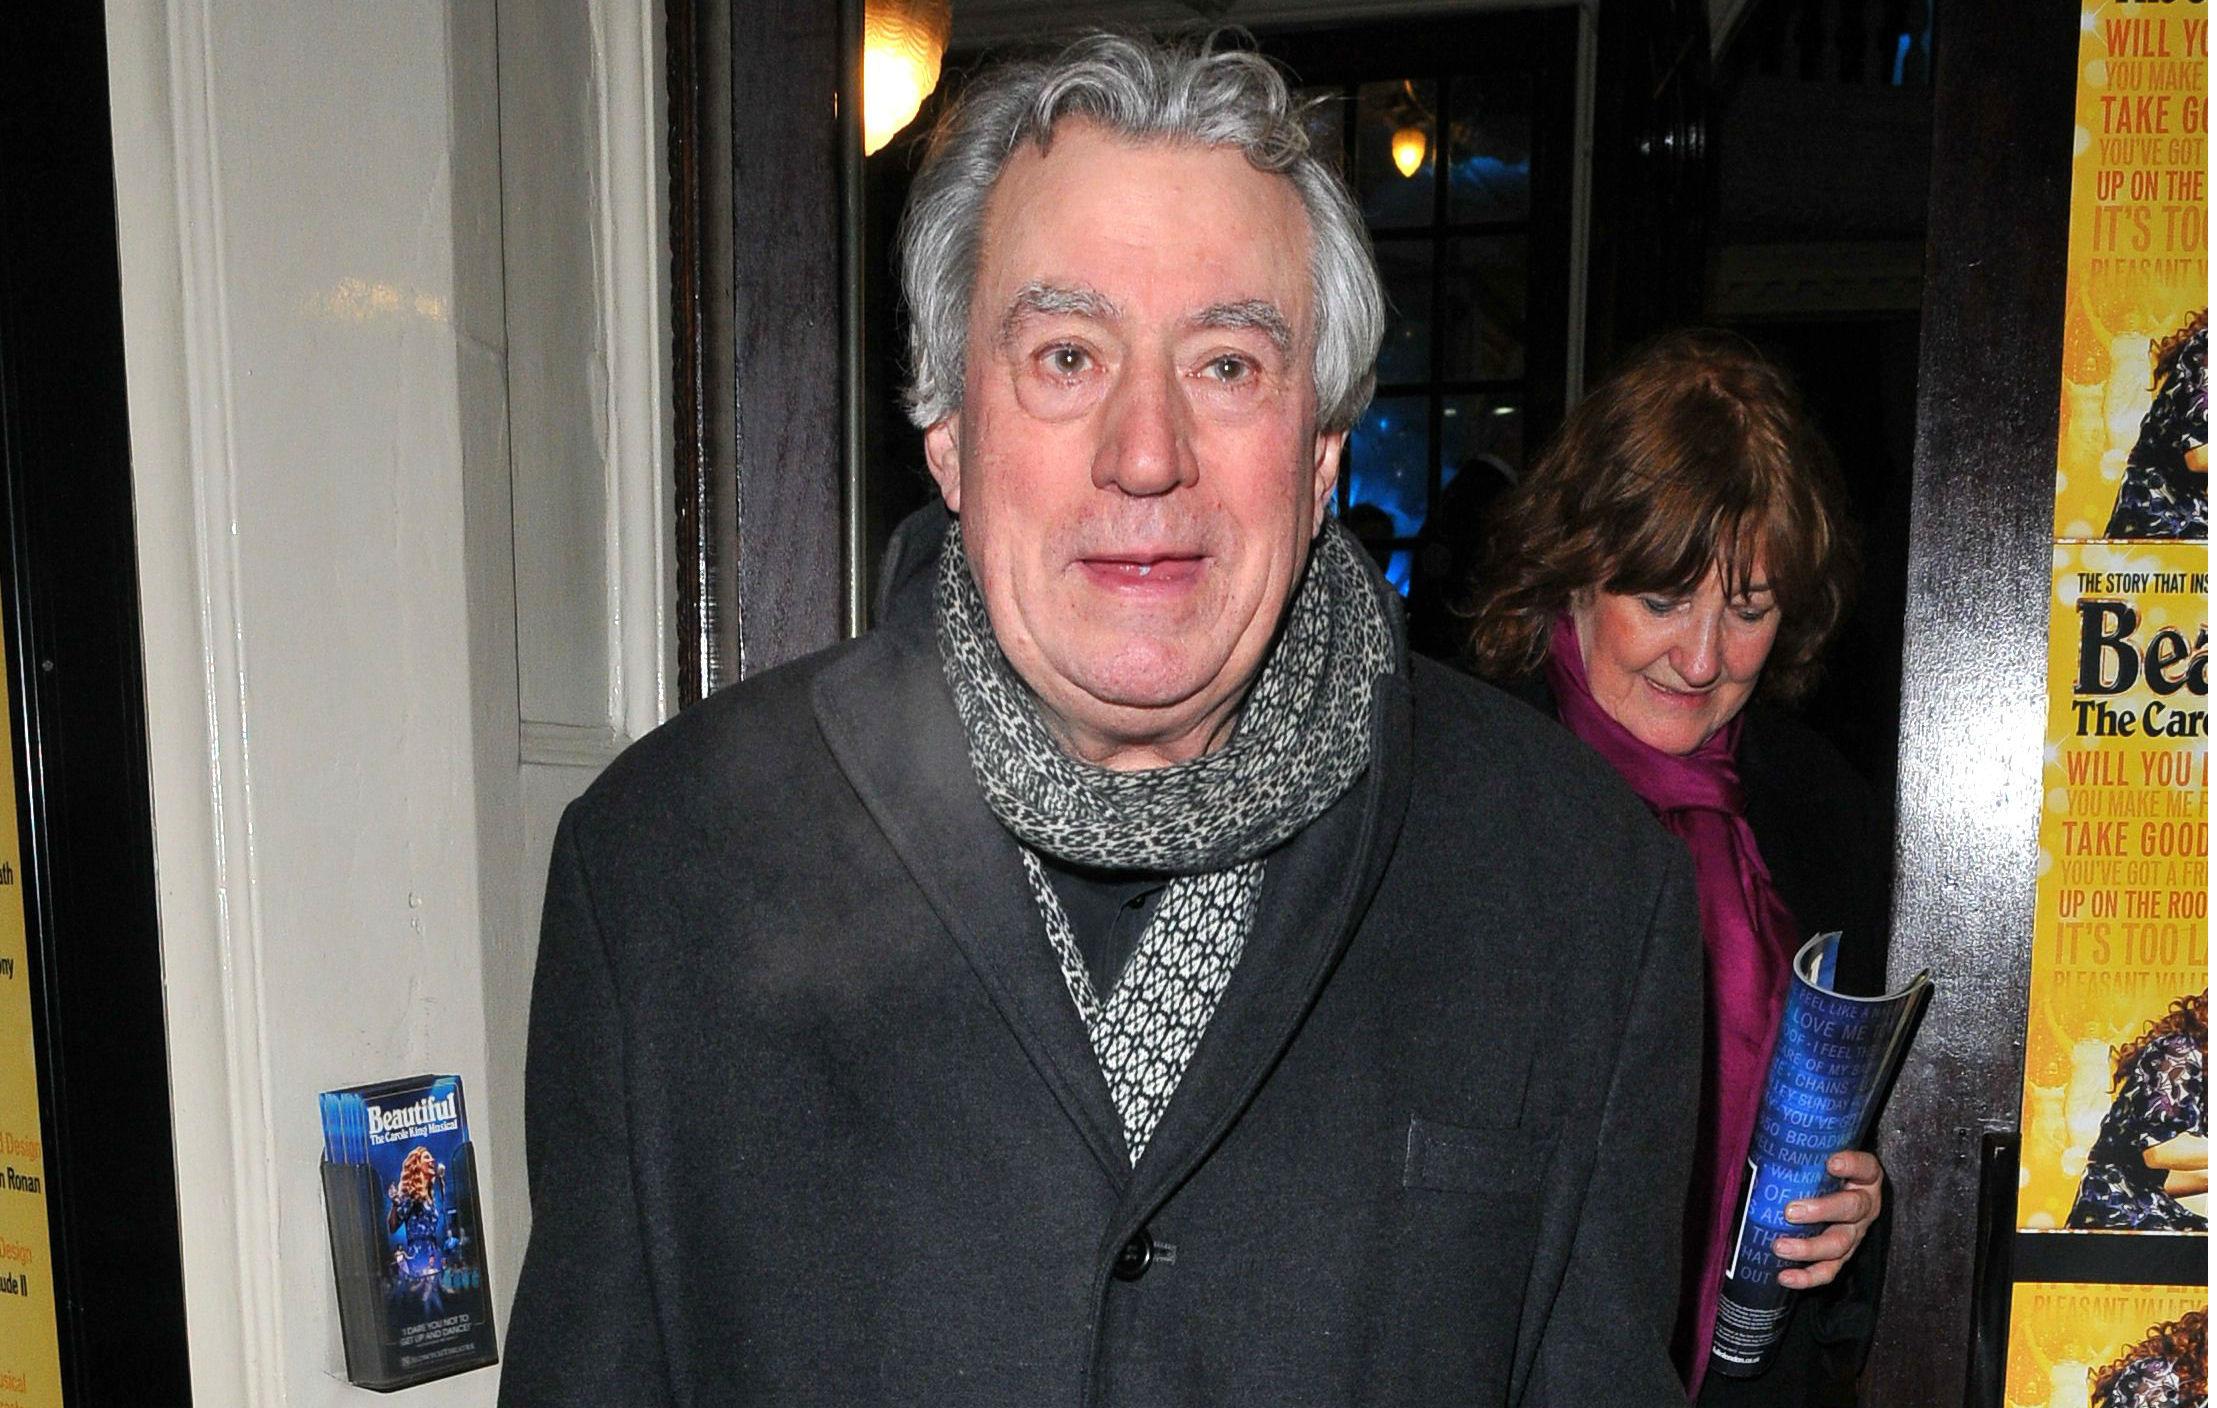 Monty Python star Terry Jones